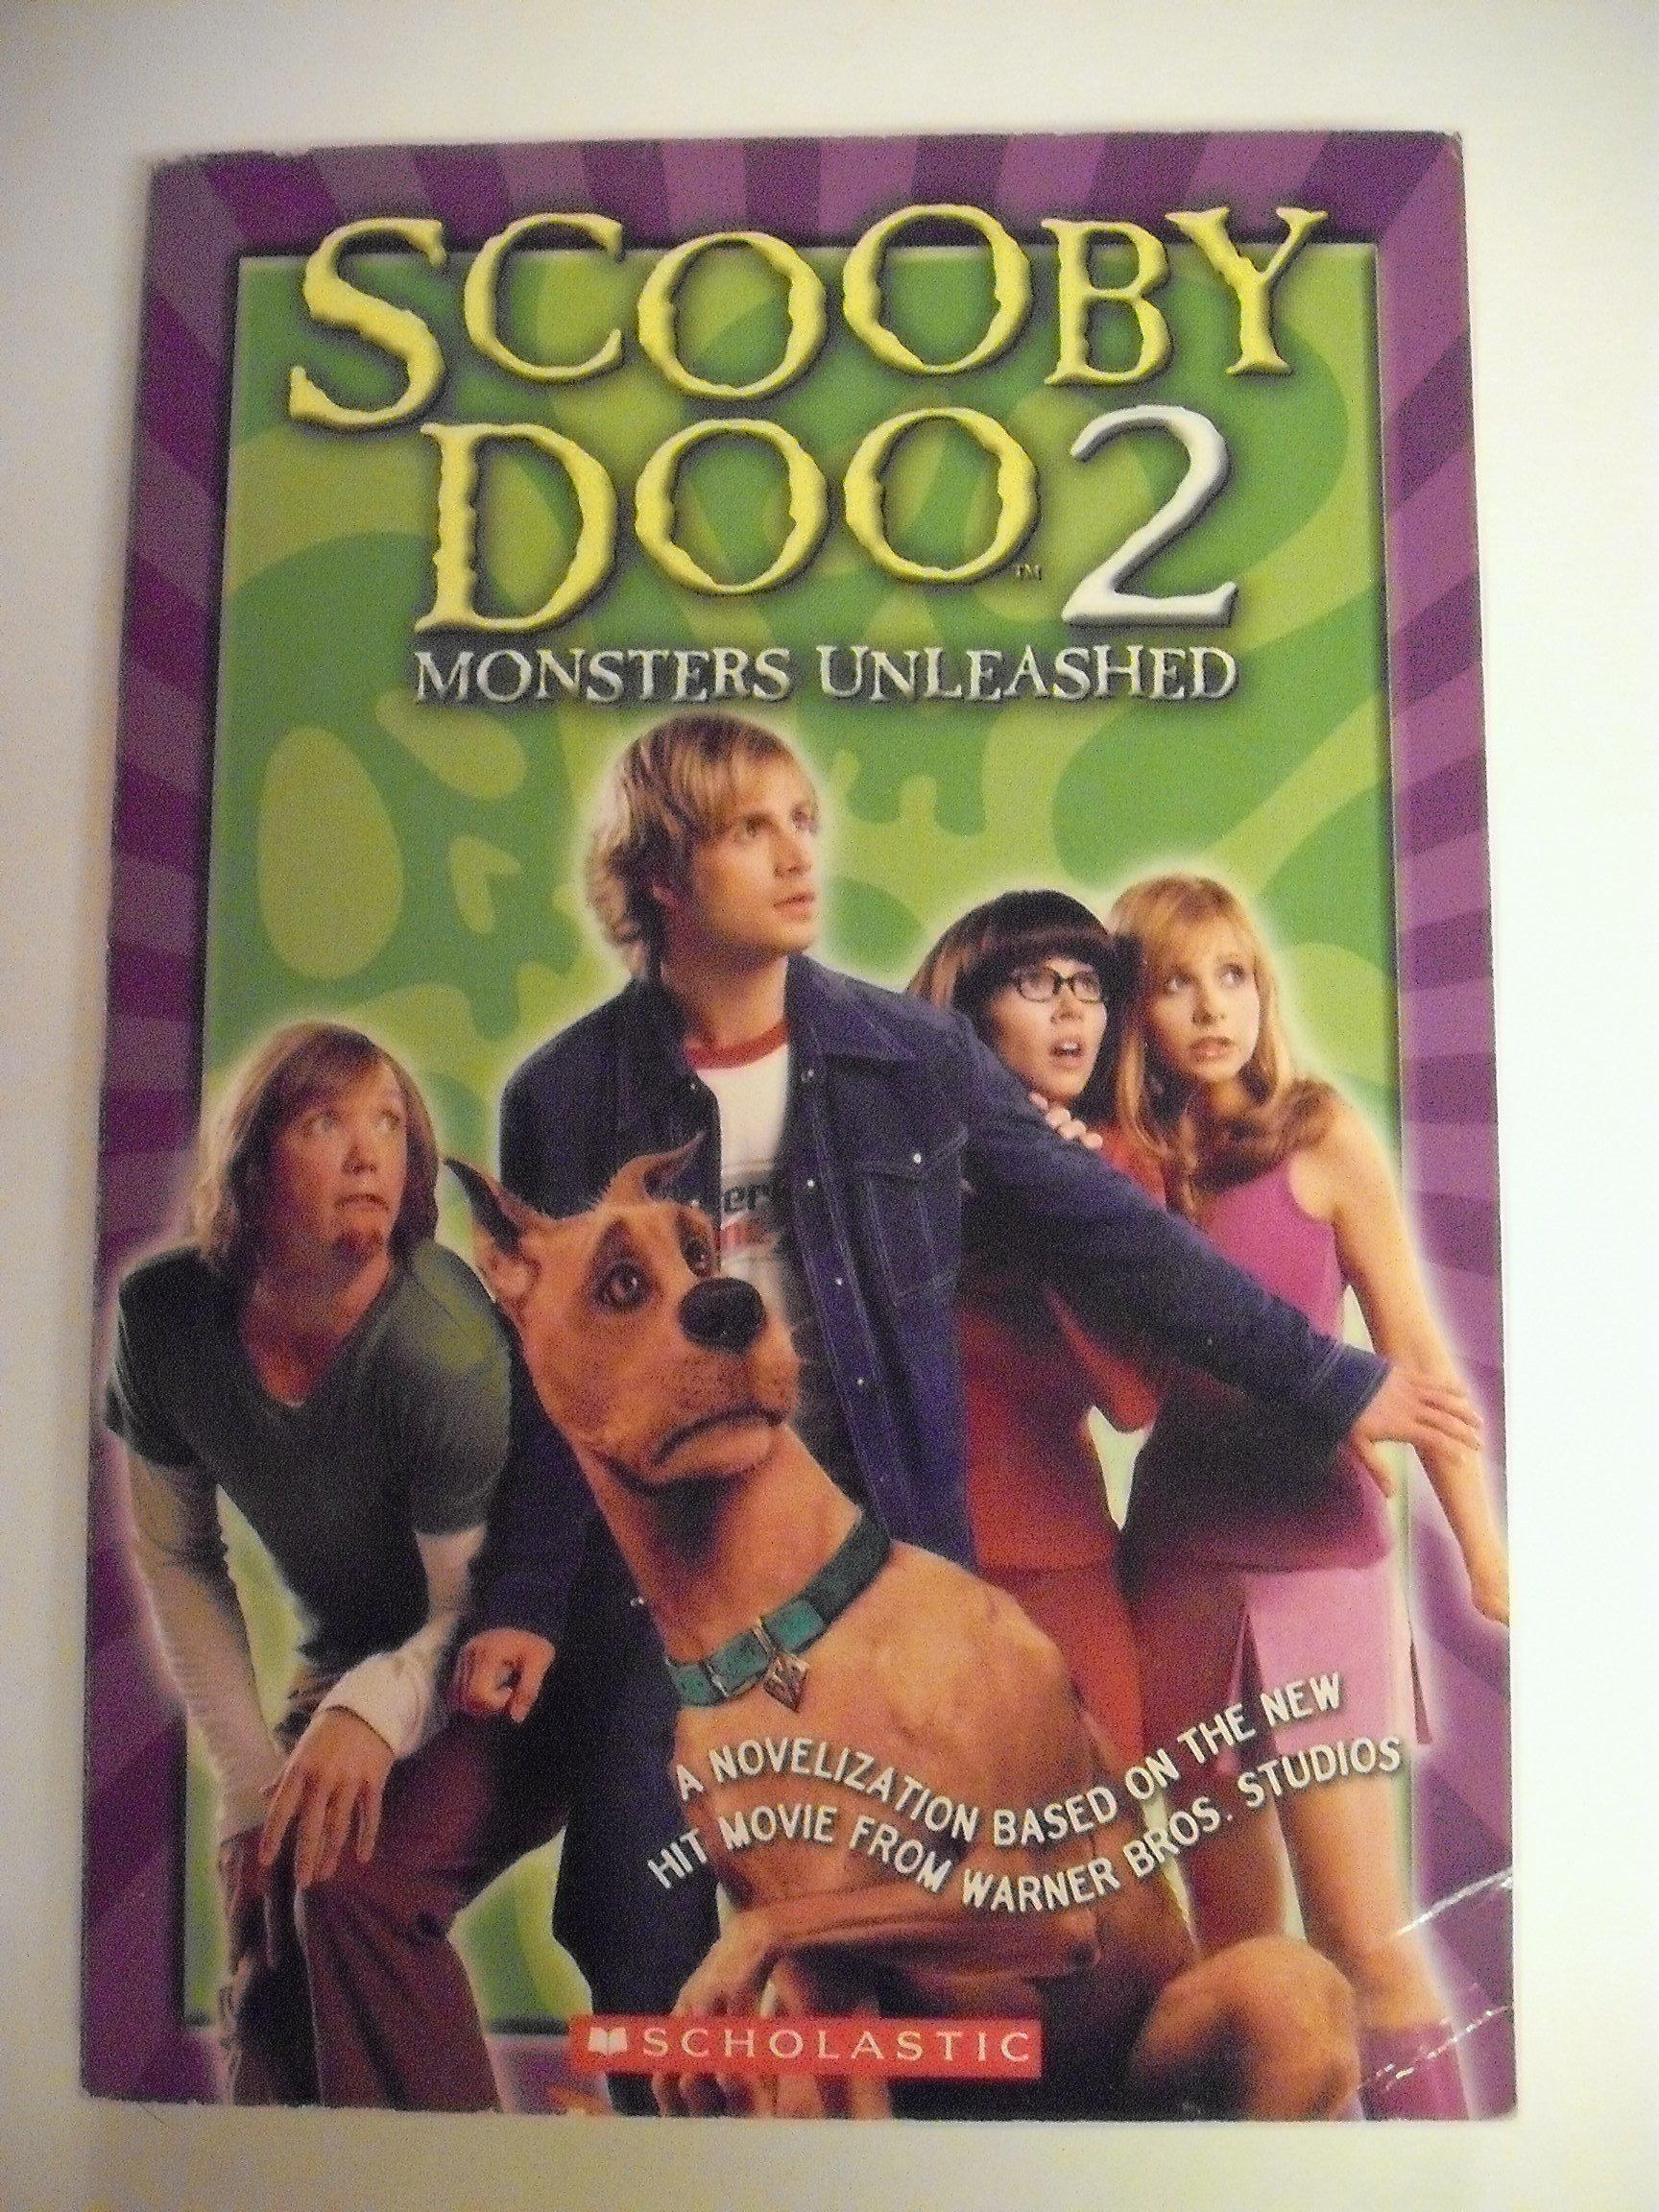 Scooby Doo 2 Monsters Unleashed Junior Novelization 9780439567558 Amazon Com Books